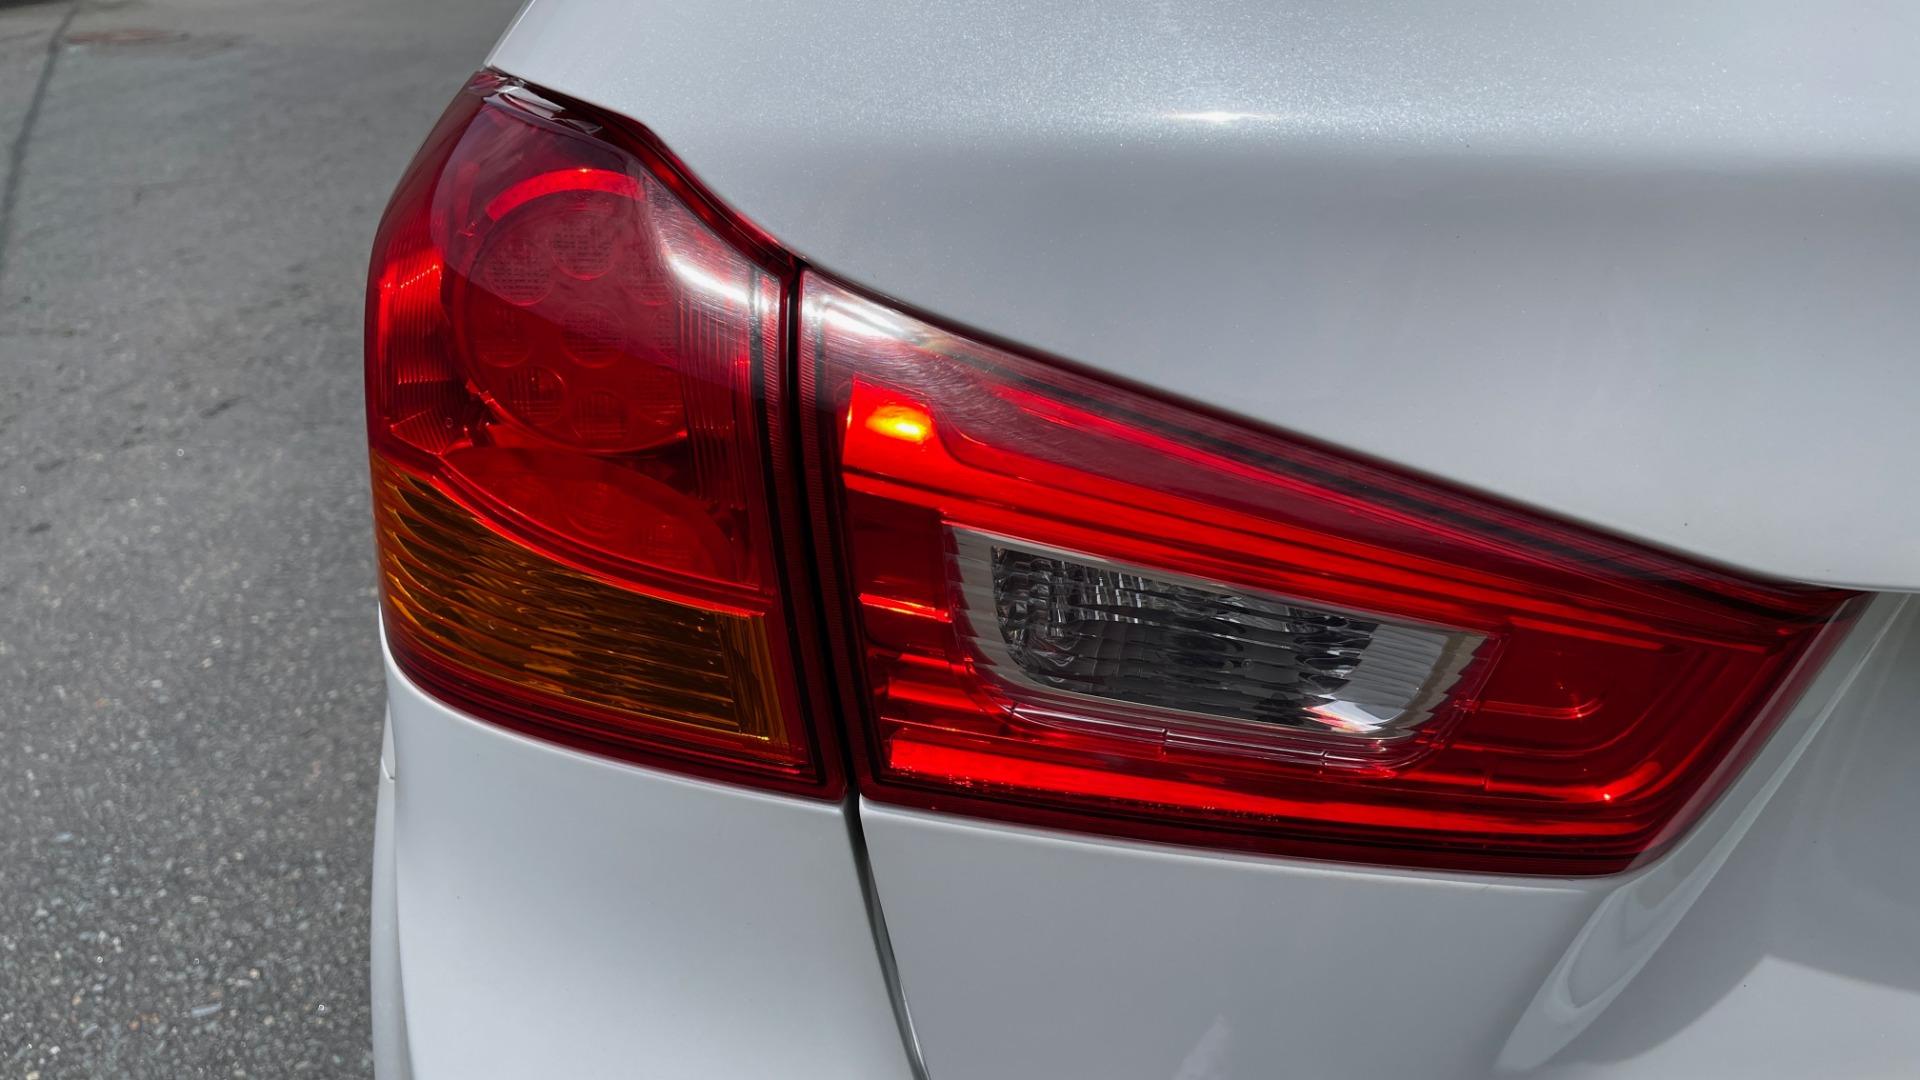 Used 2014 Mitsubishi OUTLANDER SPORT ES 2WD / 2.0L / CVT TRANS / 18IN WHEELS / 31MPG for sale $8,495 at Formula Imports in Charlotte NC 28227 17